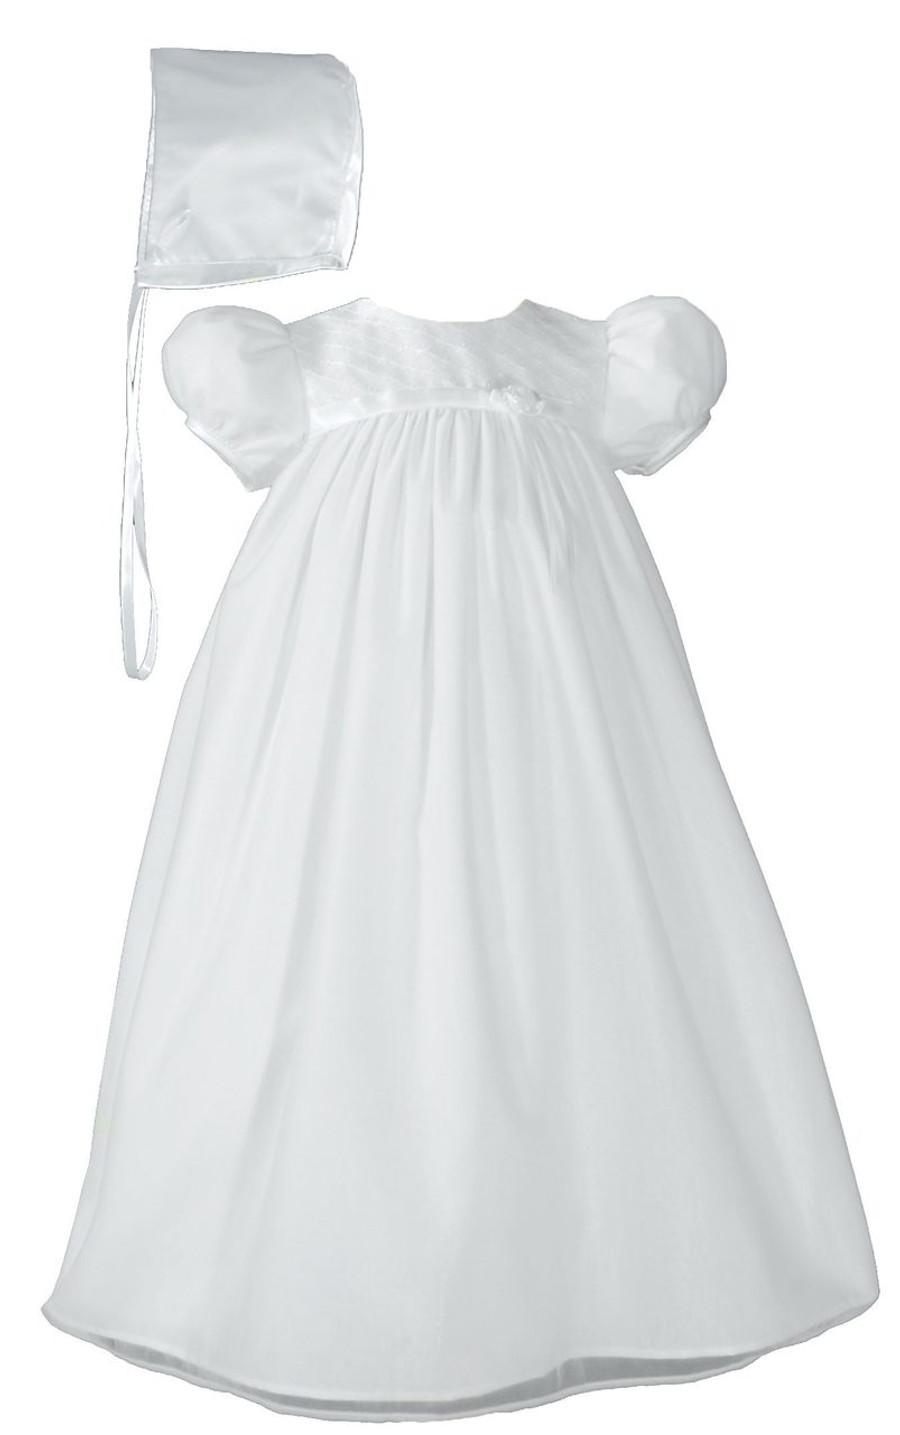 Baby Girls White Embroider Taffeta Christening Dress